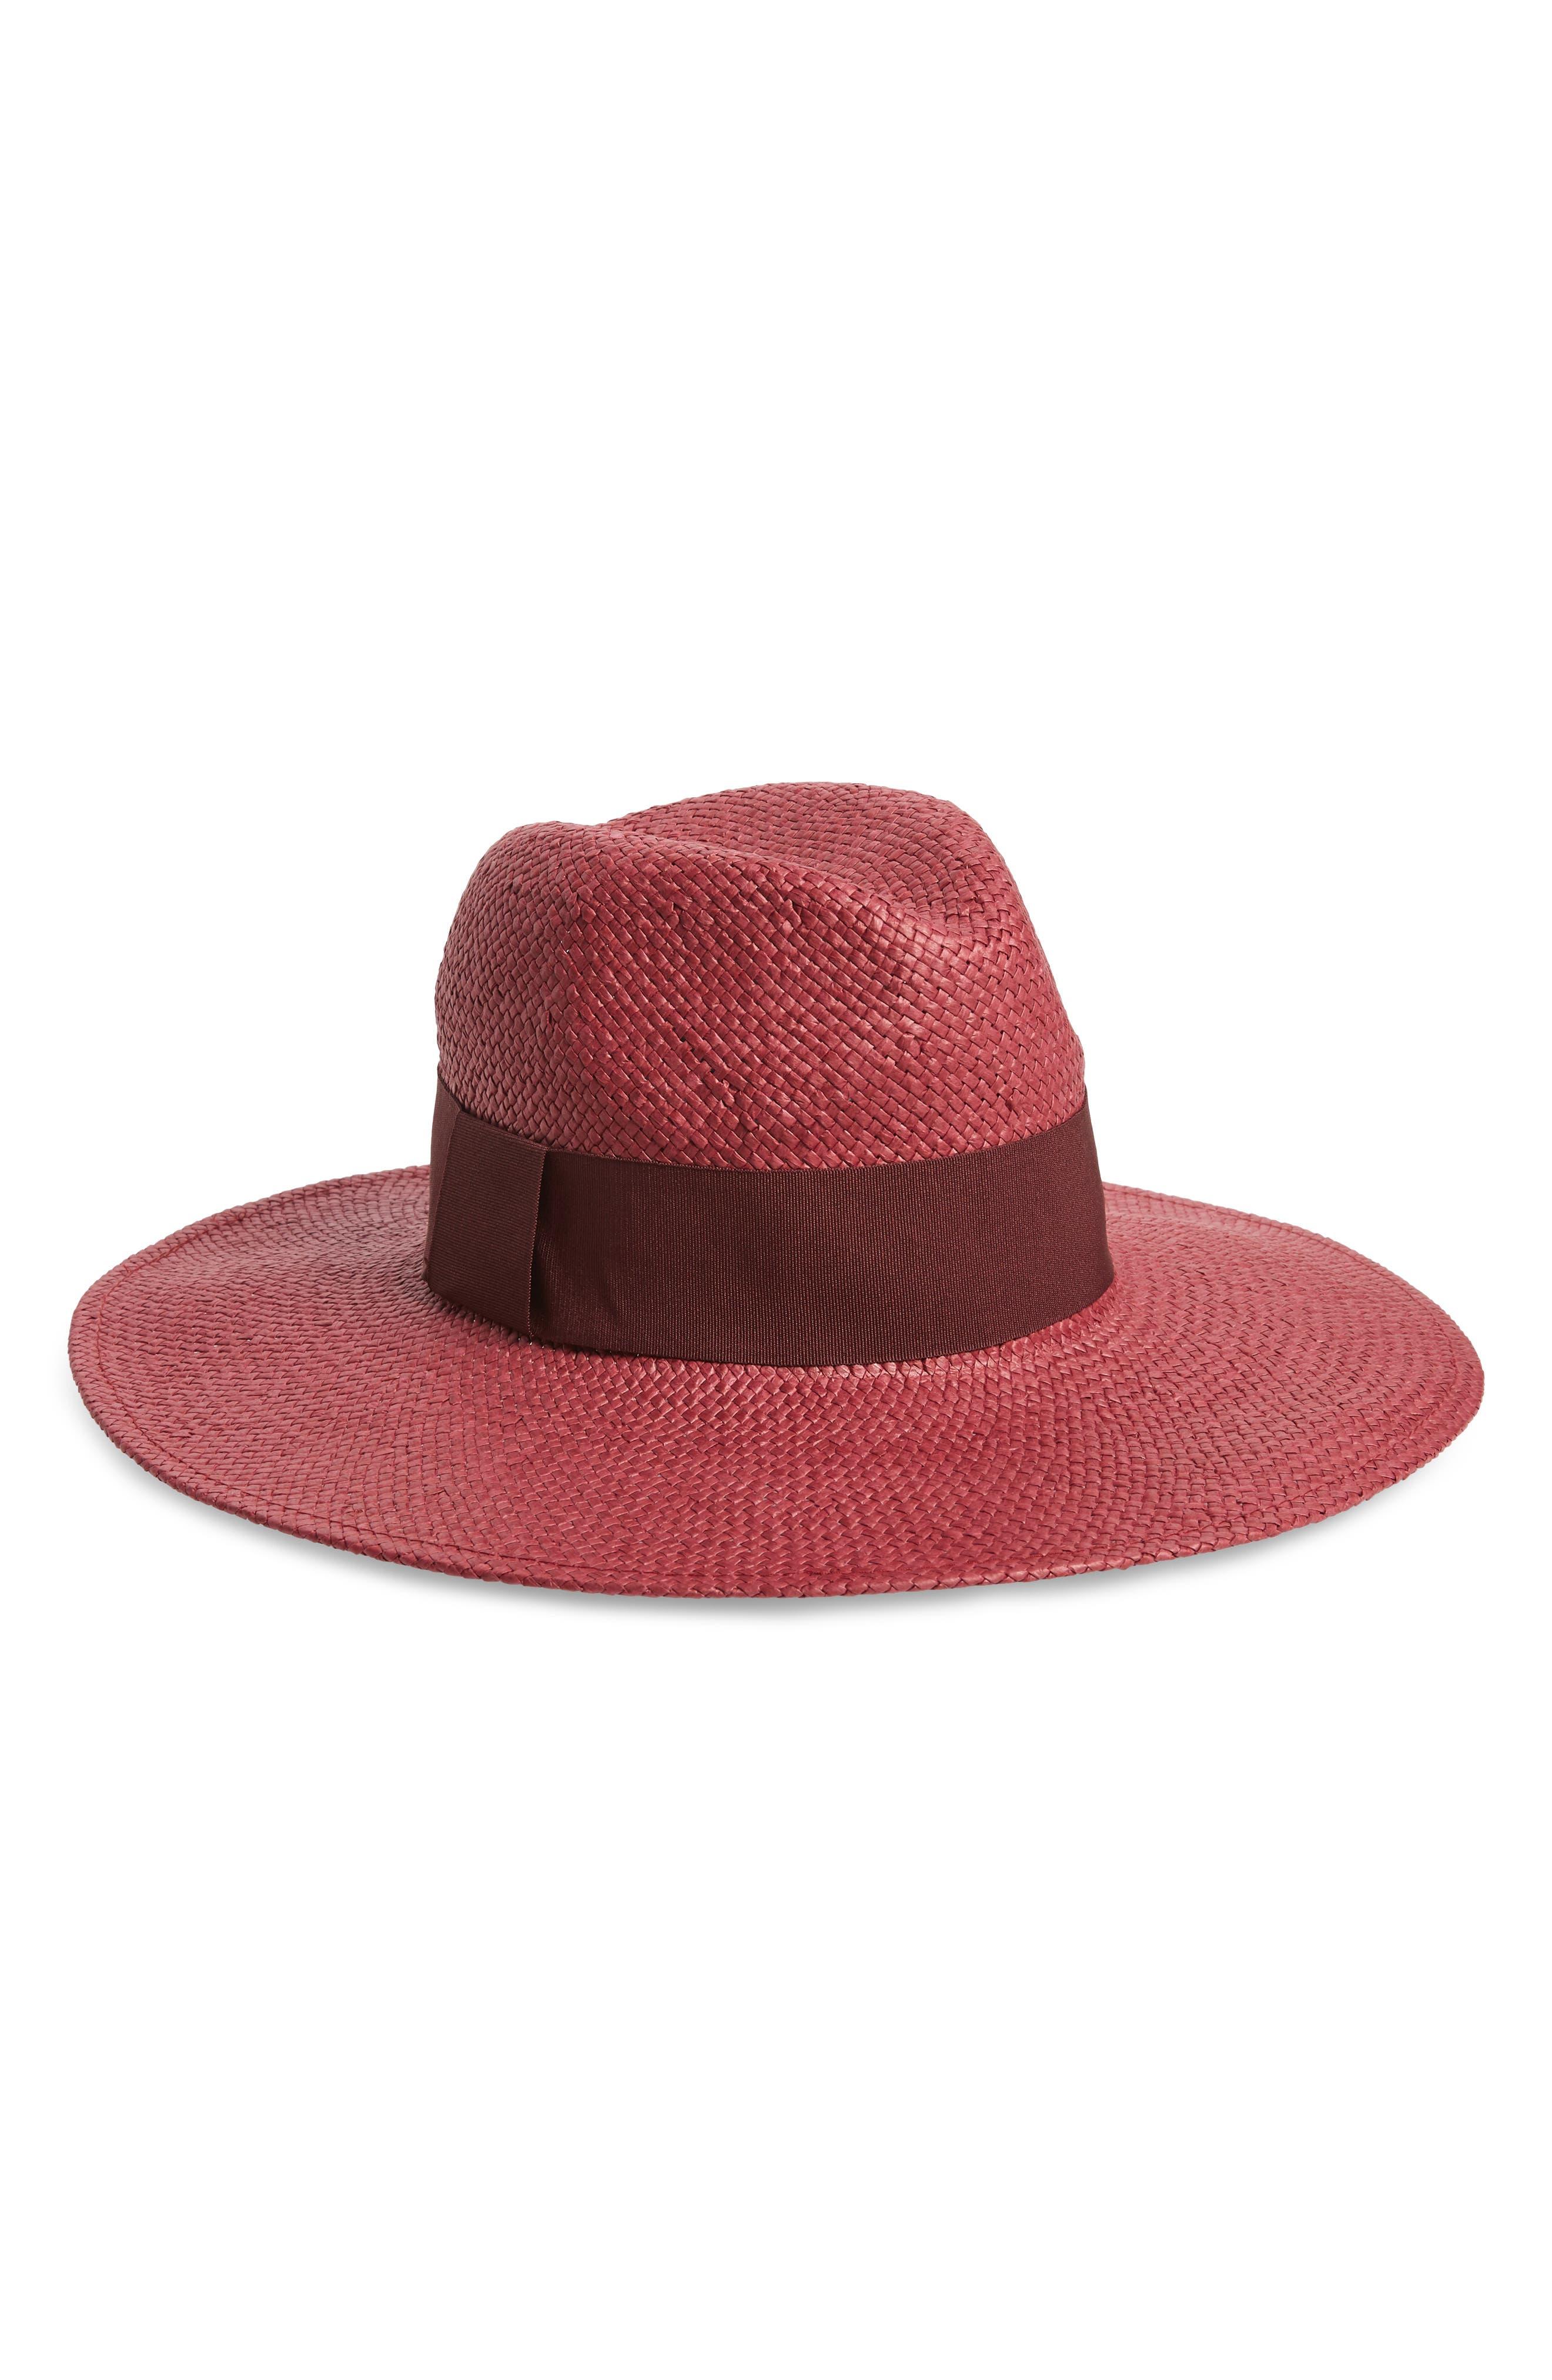 HALOGEN<SUP>®</SUP> Fashion Woven Panama Hat, Main, color, BURGUNDY